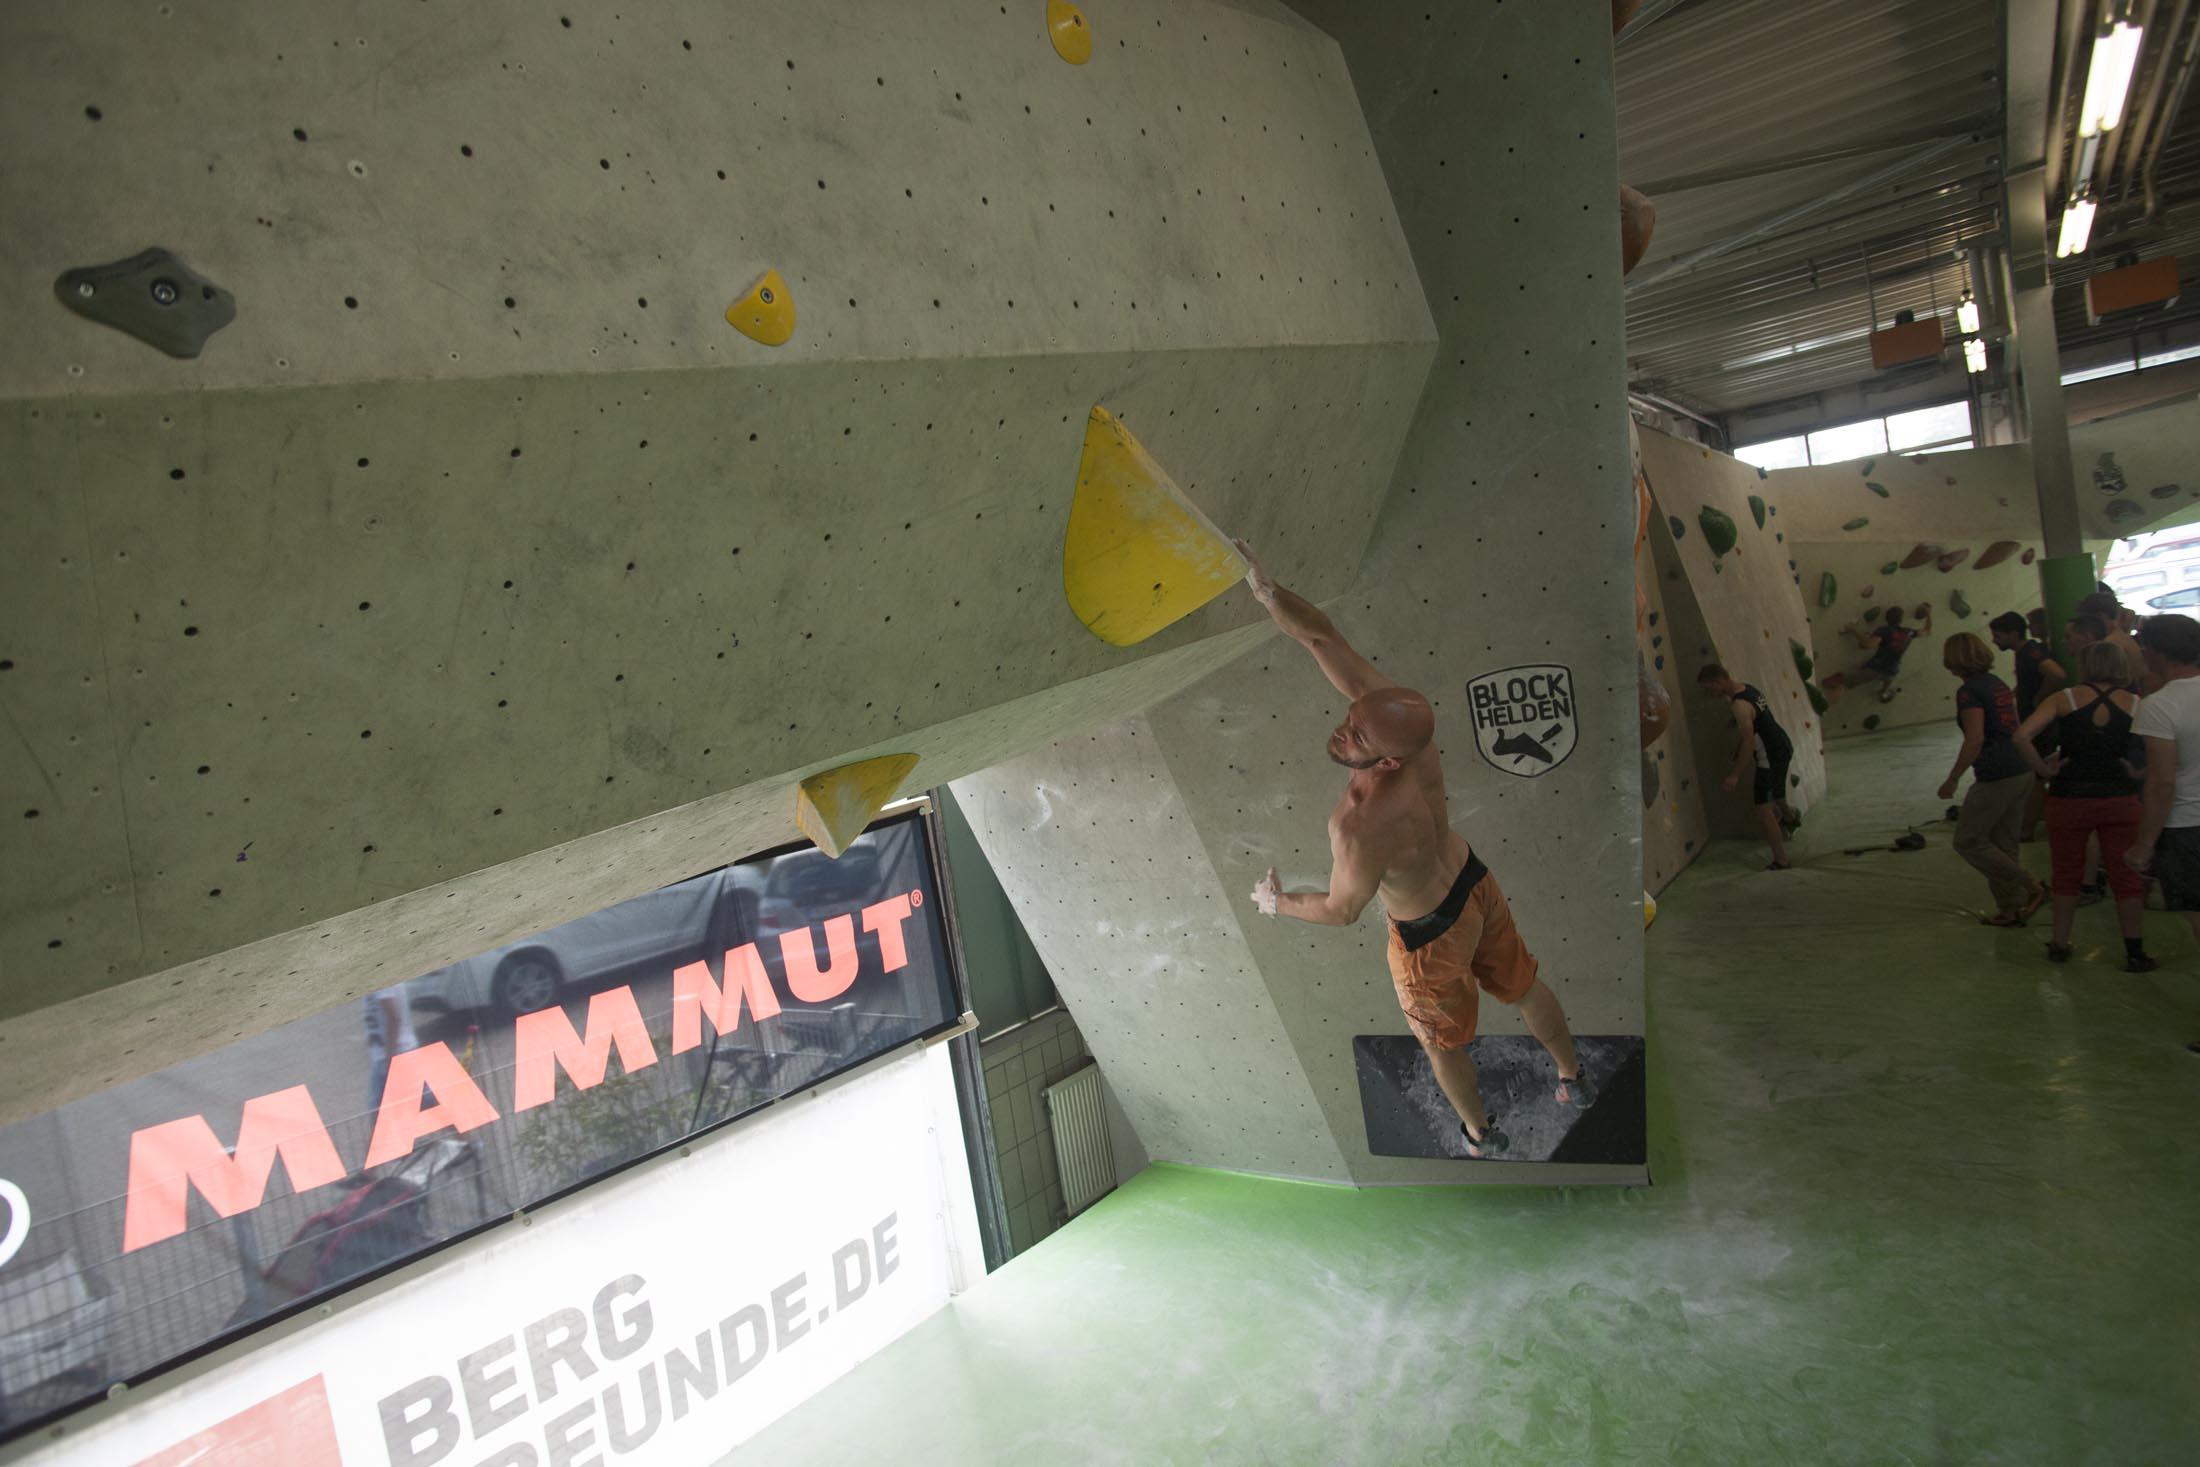 Quali, internationaler bouldercup Frankenjura 2016, BLOCKHELDEN Erlangen, Mammut, Bergfreunde.de, Boulderwettkampf07092016386